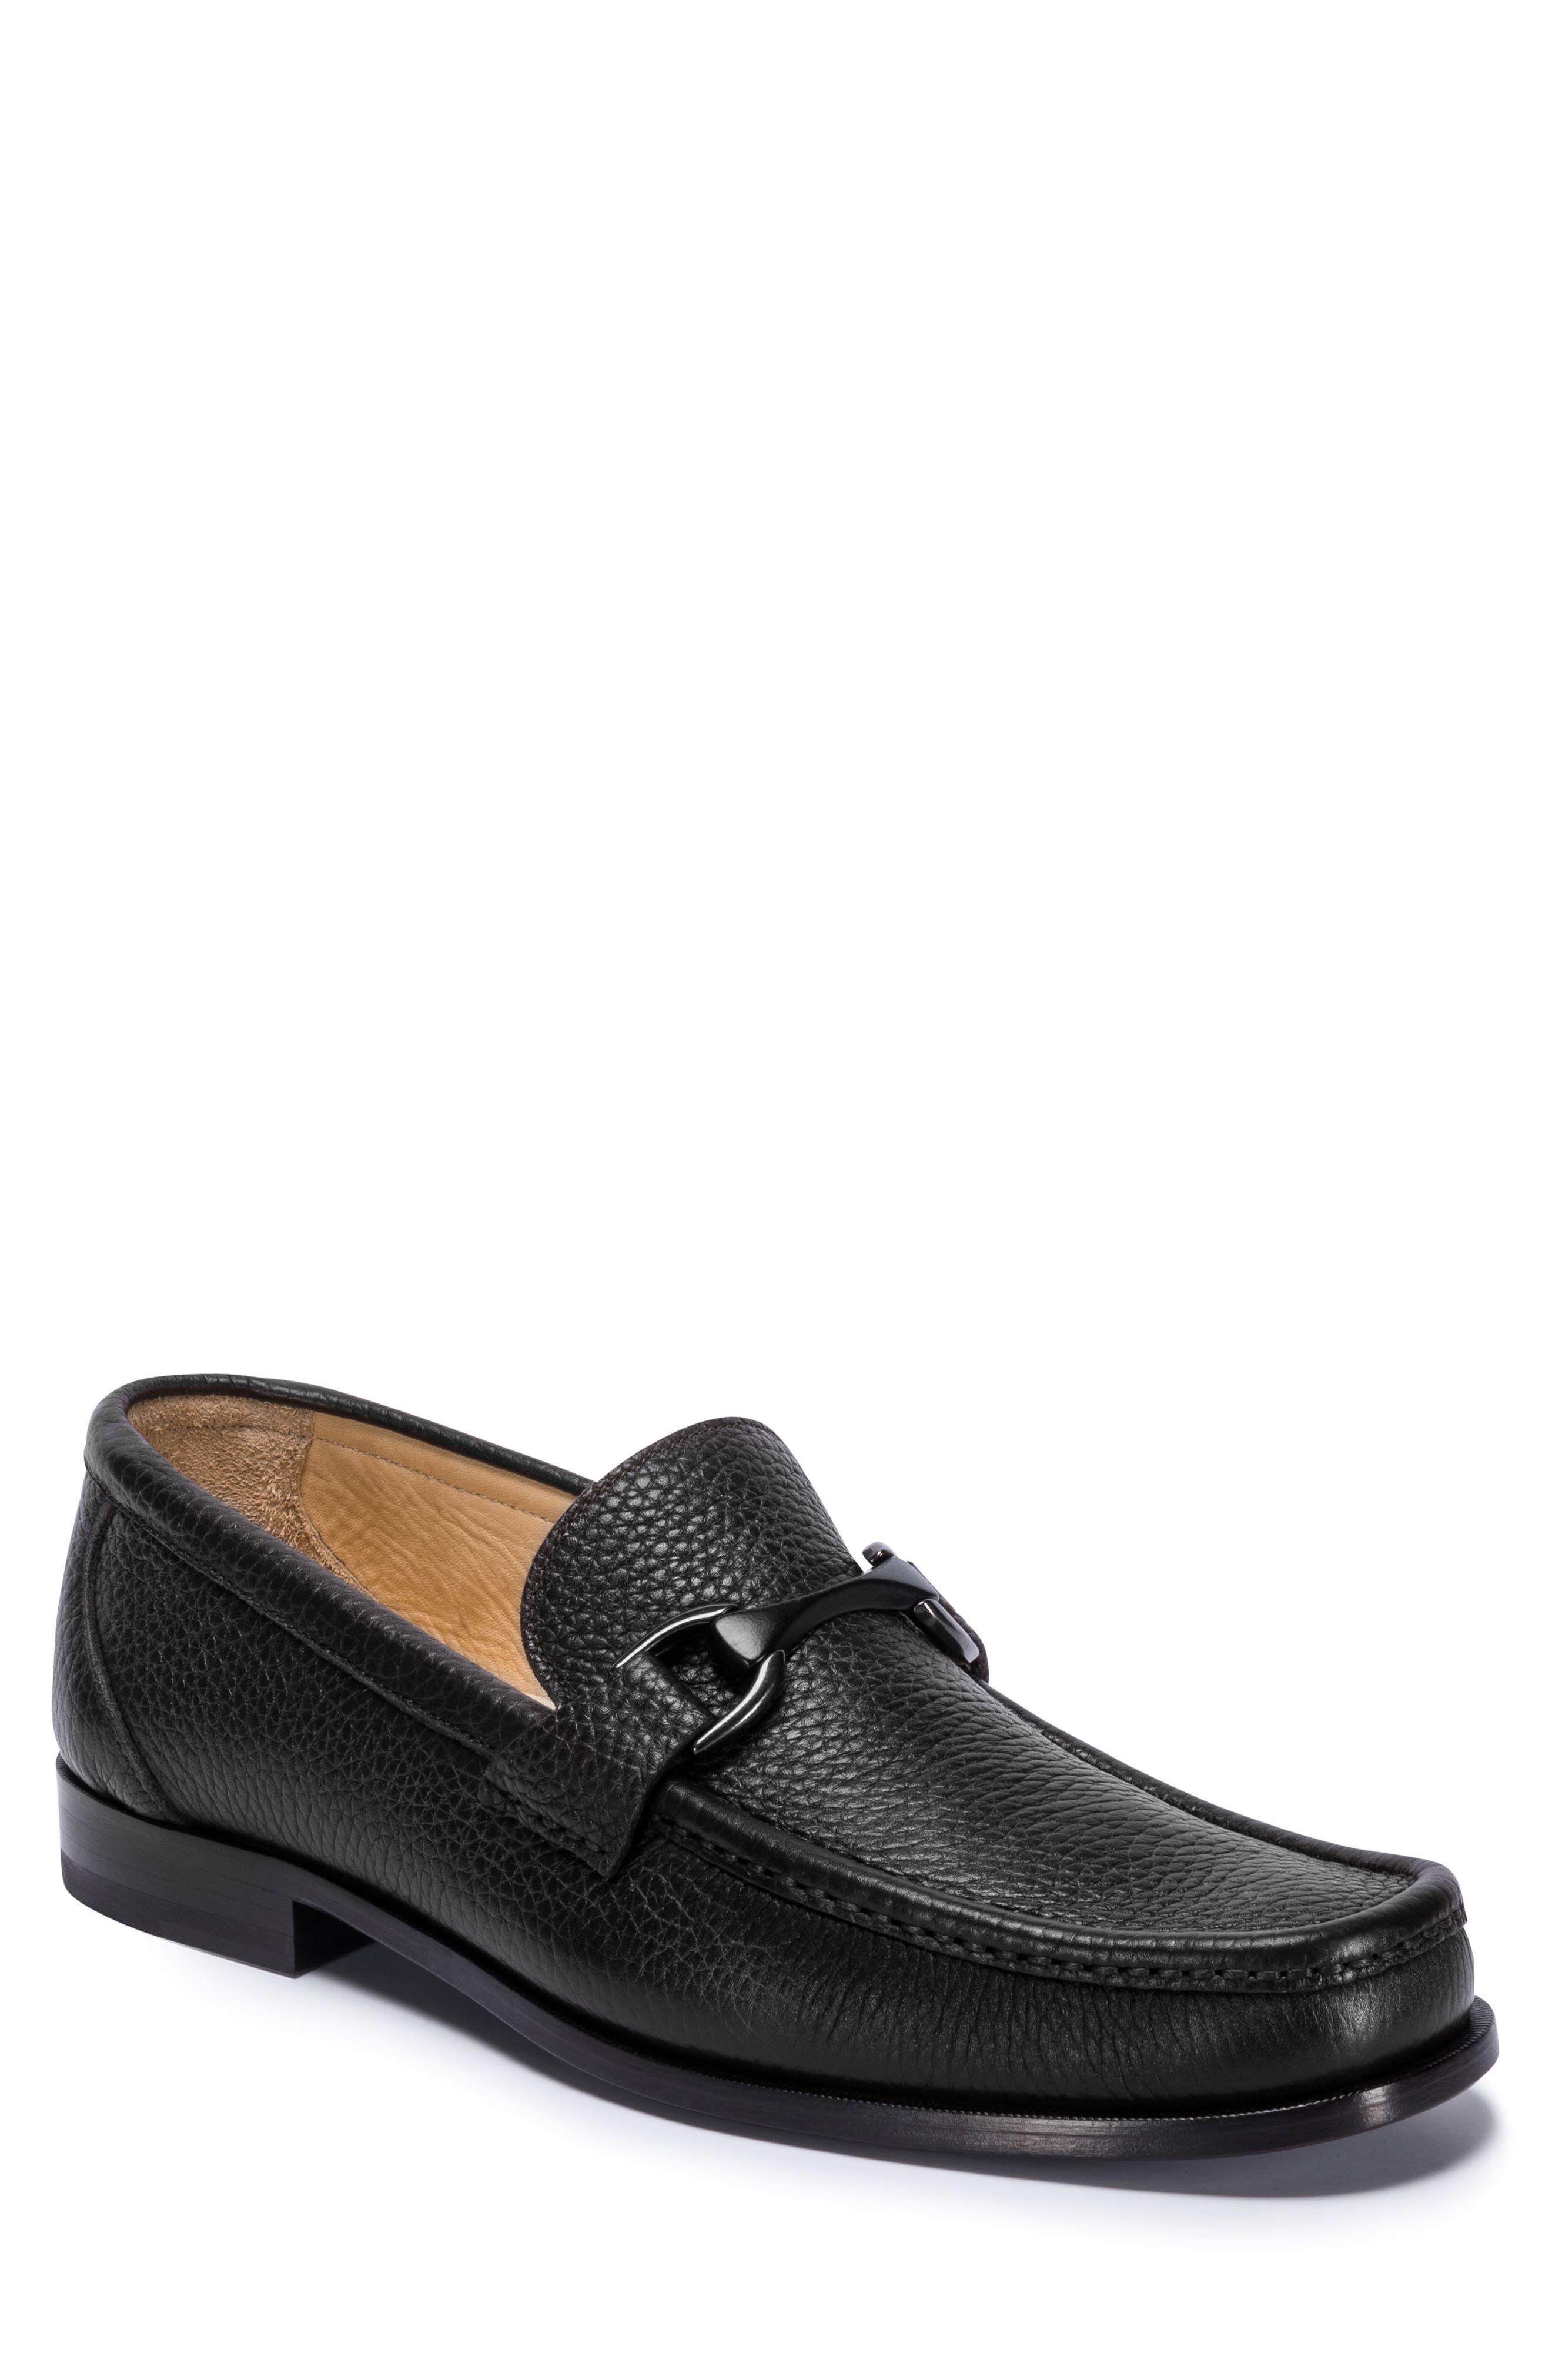 Padua Bit Loafer,                         Main,                         color, NERO LEATHER